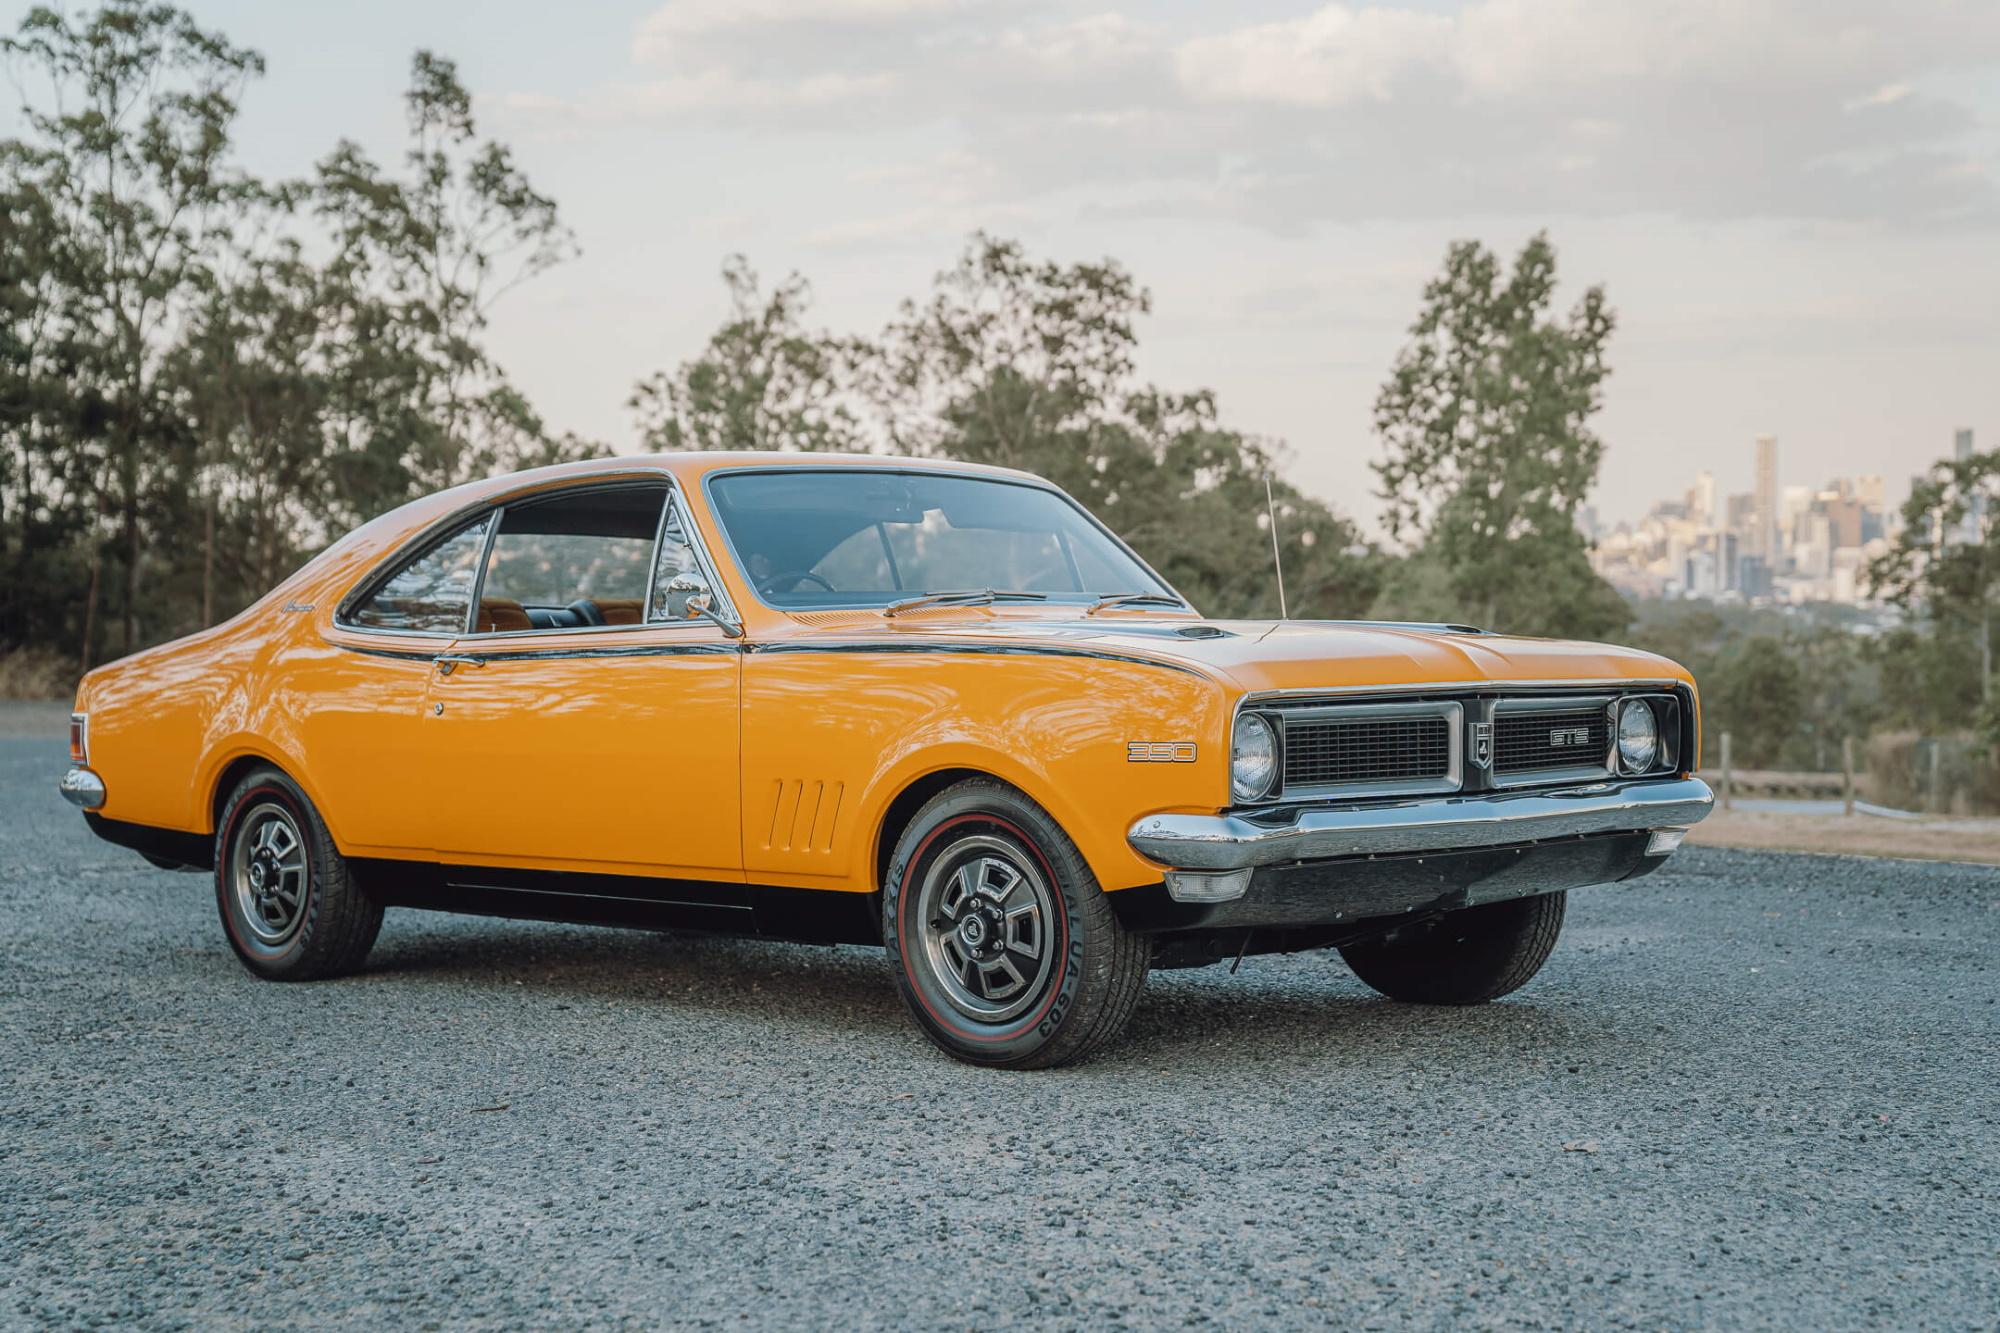 Win a 1970 Holden Monaro